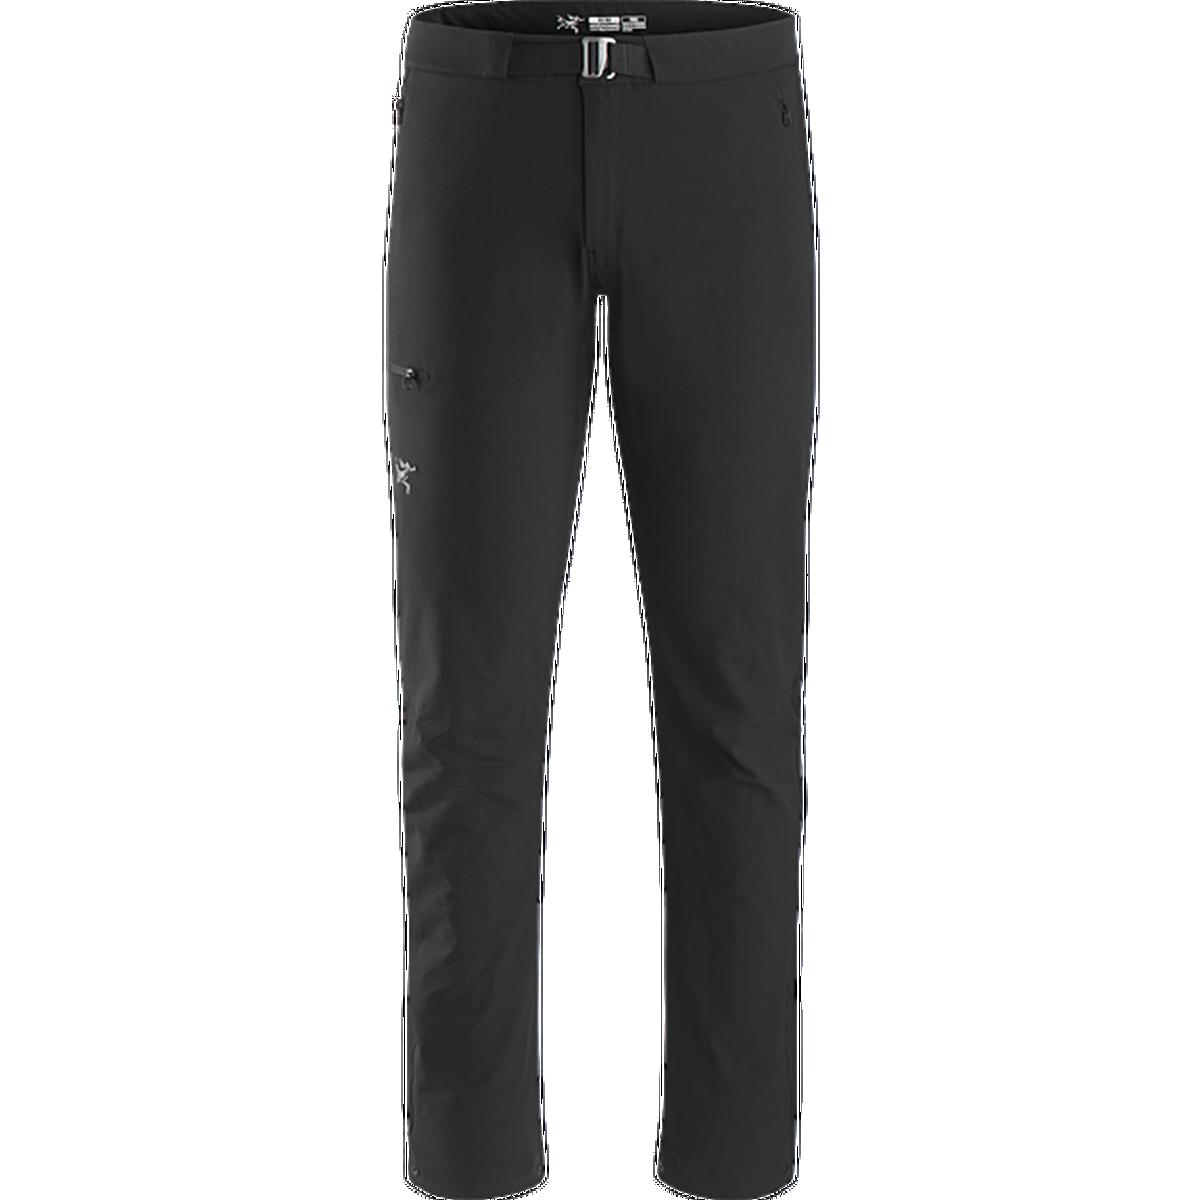 Arcteryx Arc'teryx Men's Gamma LT Pant Tall - Black